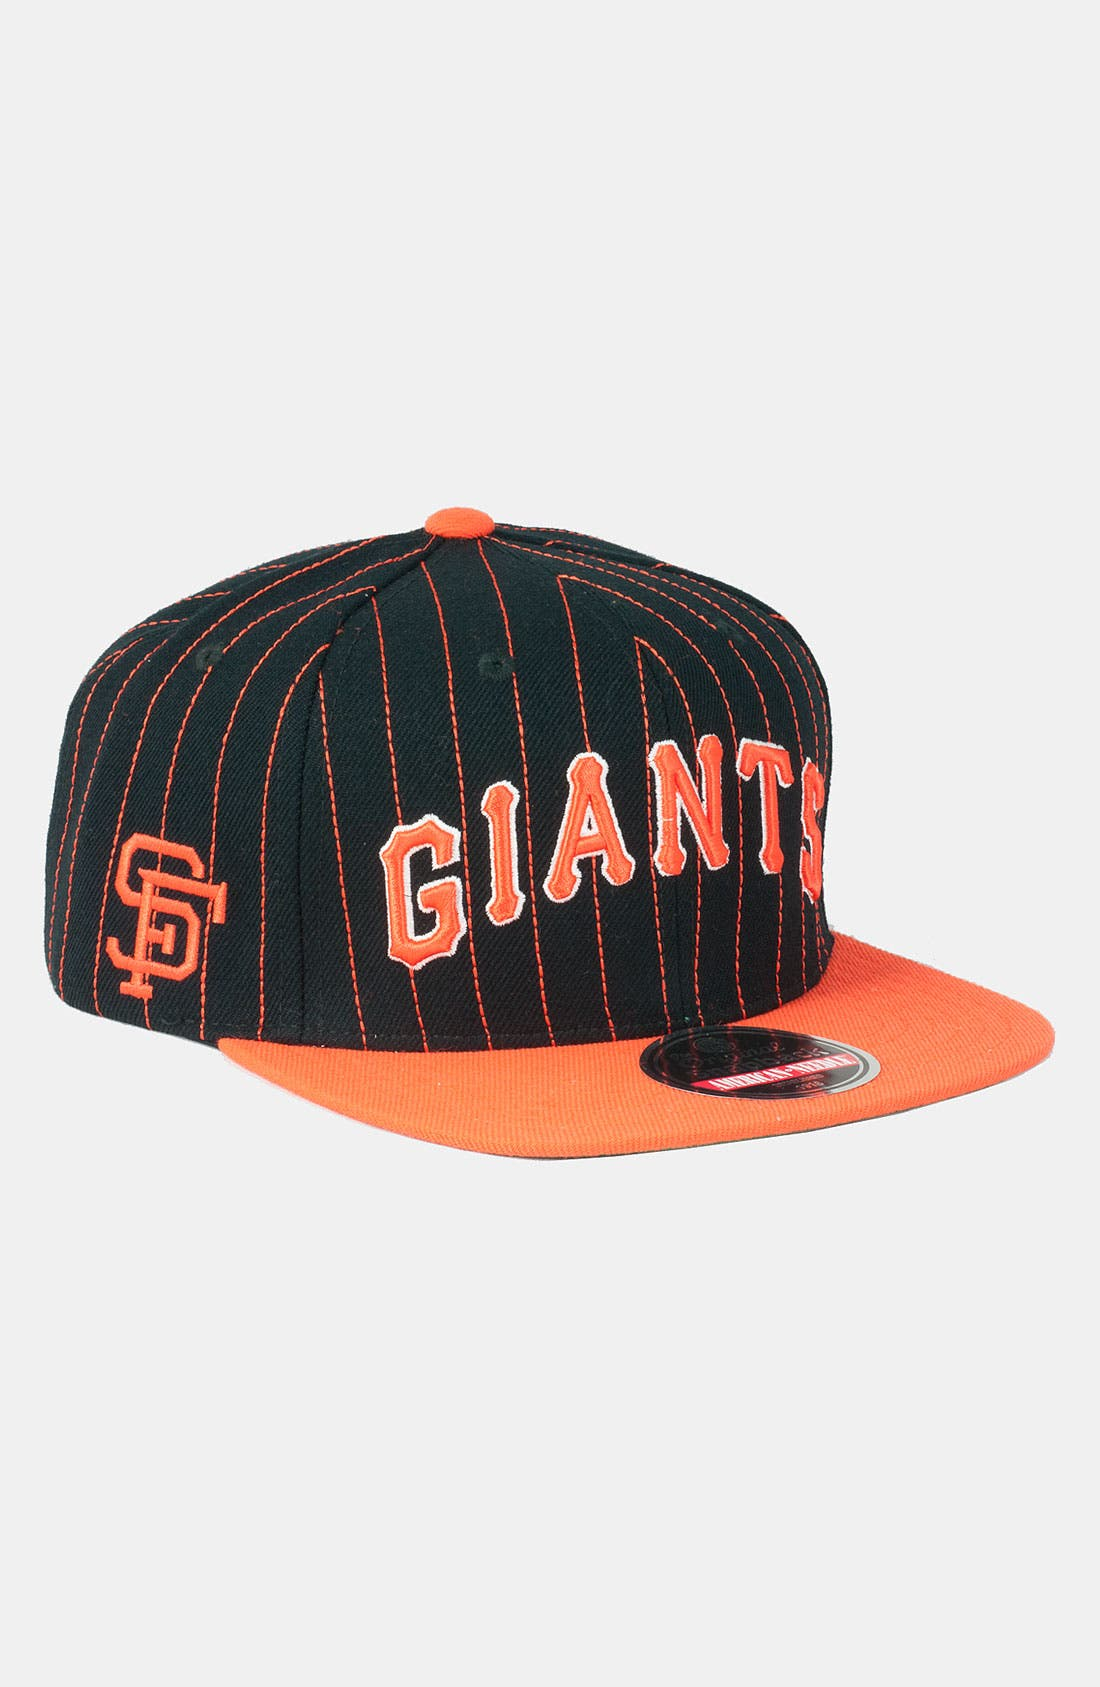 Alternate Image 1 Selected - American Needle 'Giants' Snapback Baseball Cap